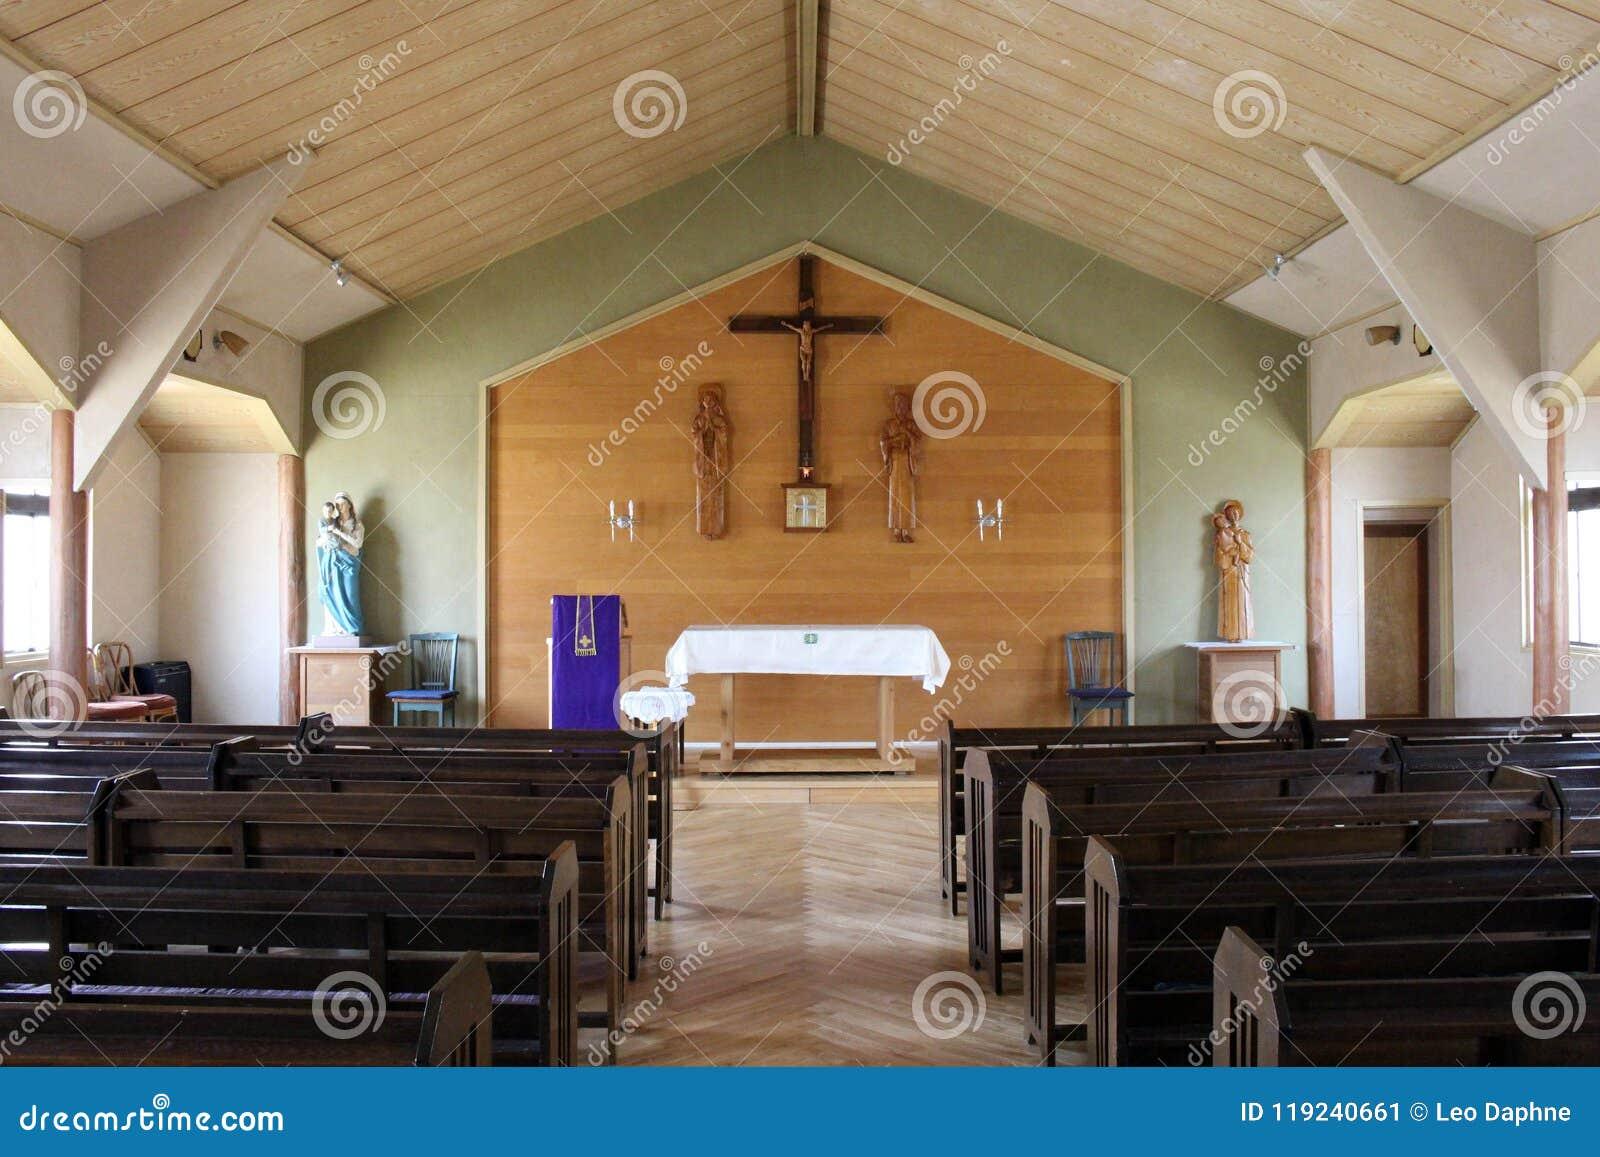 `Saint Anthony` Catholic Church in Nikko. A simple wooden church. Taken in Nikko,